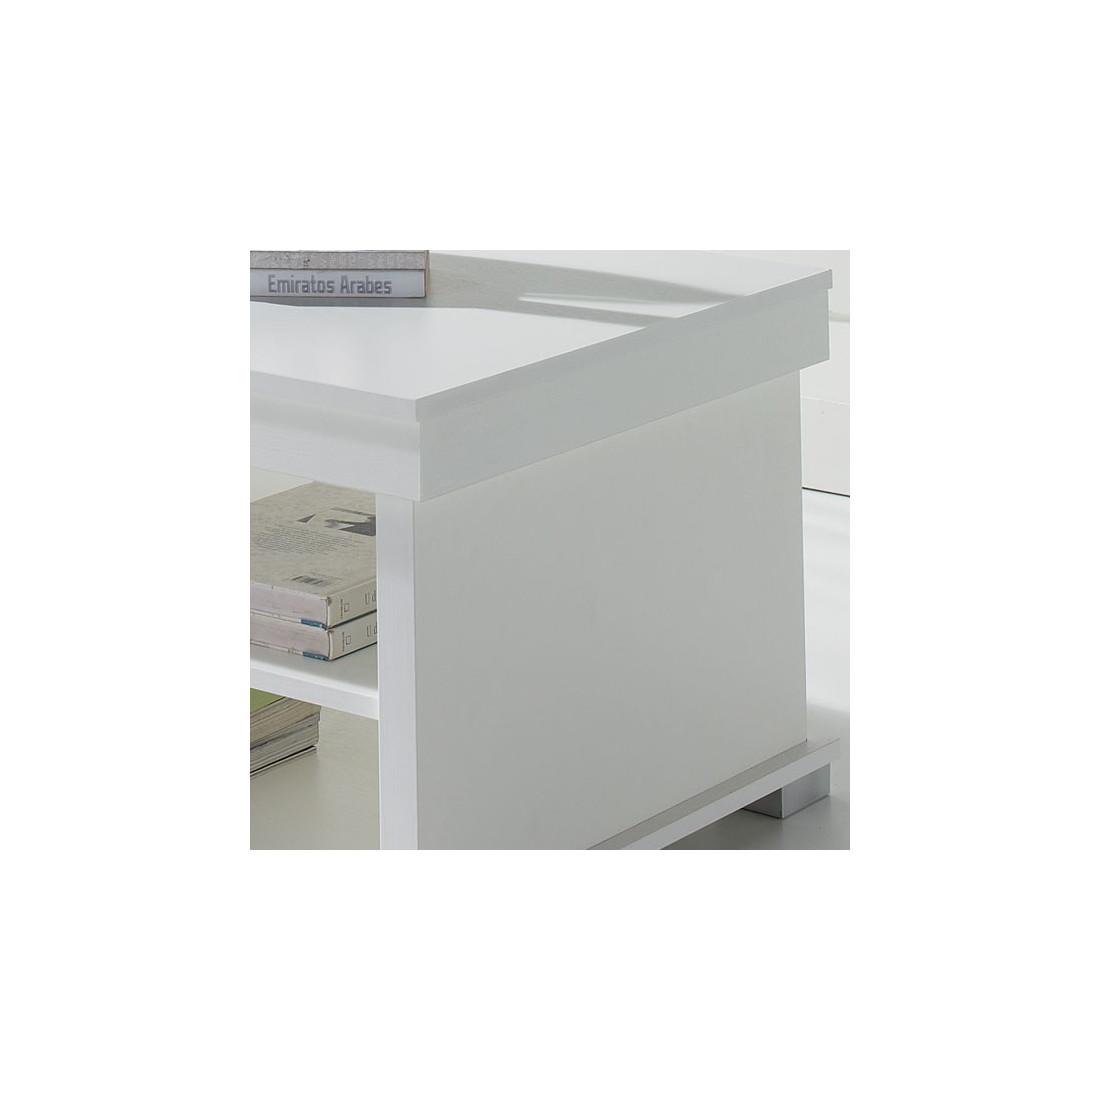 Table basse blanche relevable nese univers du salon - Table basse blanche relevable ...